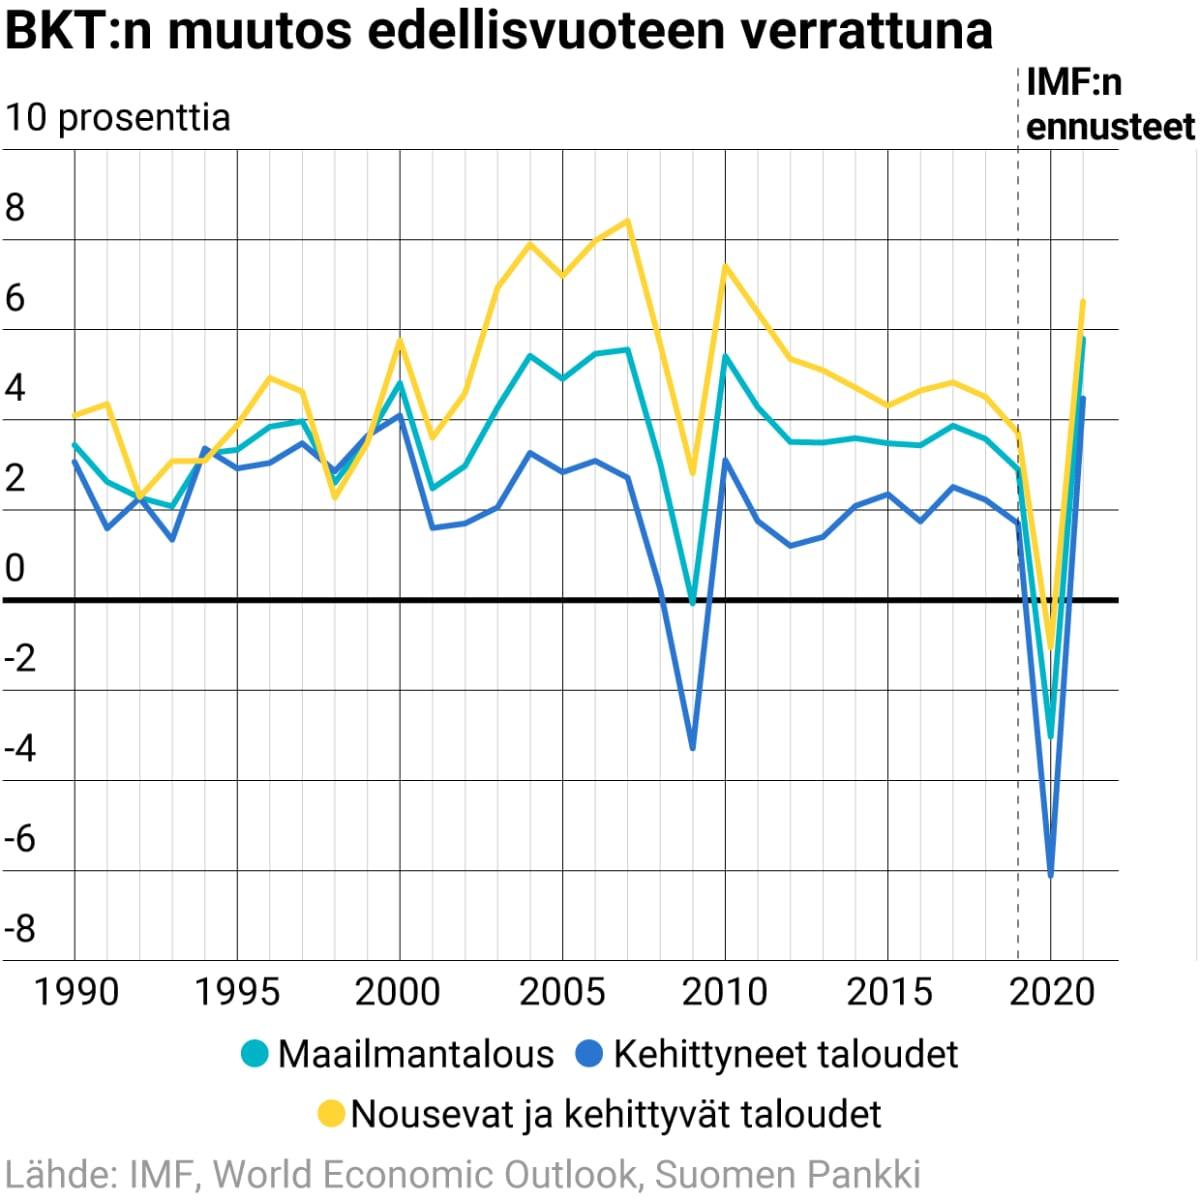 BKT:n muutos edellisvuoteen verrattuna